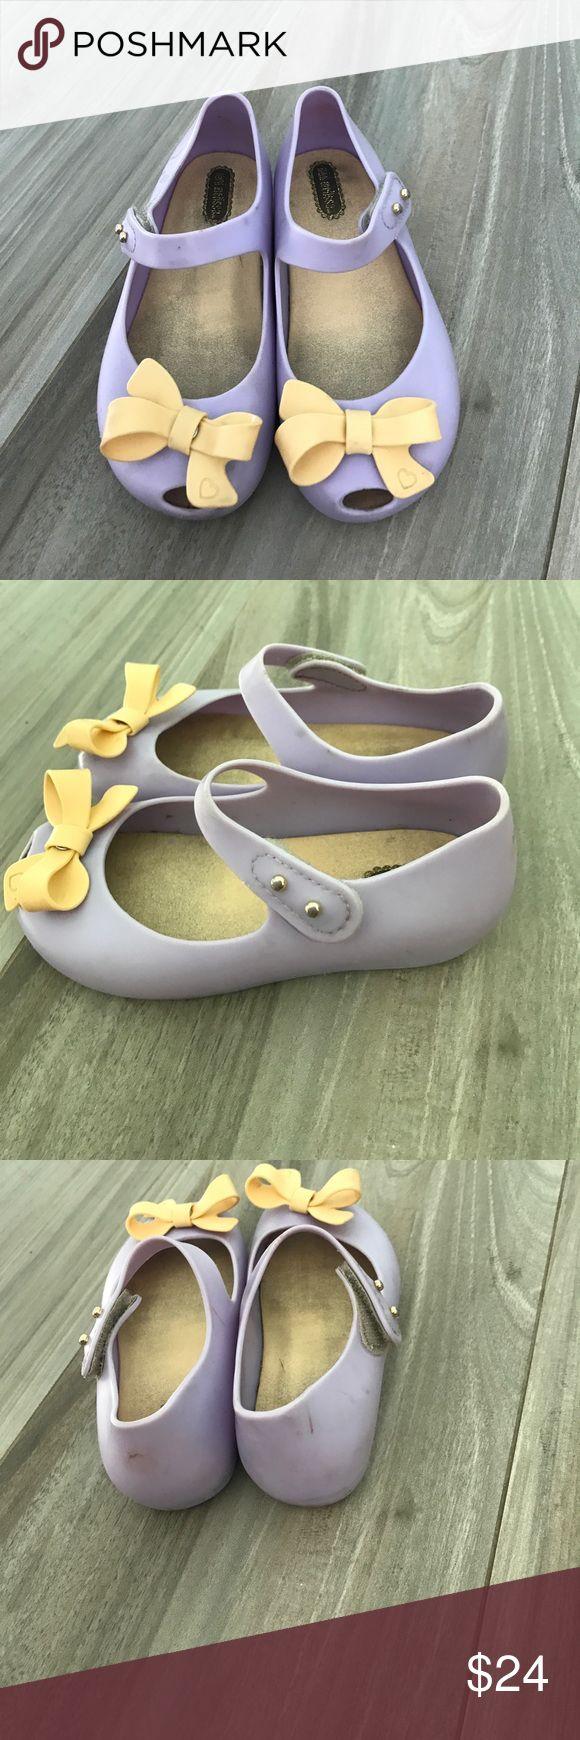 Mini Mellissa lilac shoes Used Mini Mellissa kid's shoes with orange bows Mini Melissa Shoes Sandals & Flip Flops